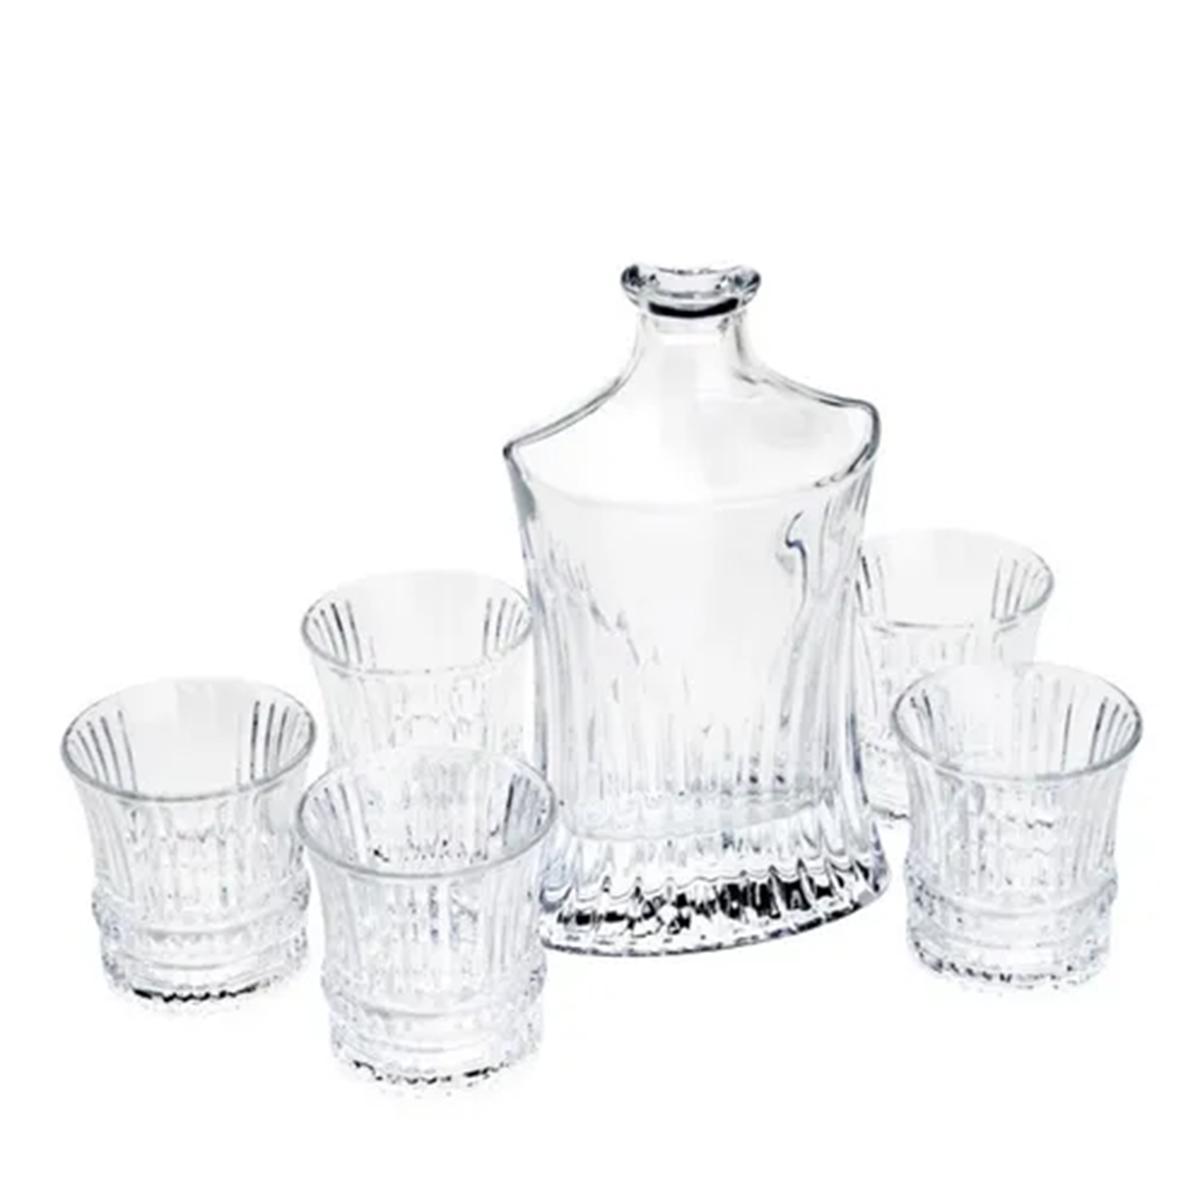 Conjunto Garrafa de Whisky 550 ml e 6 Copos de Cristal de Chumbo 240 ml  - Lemis